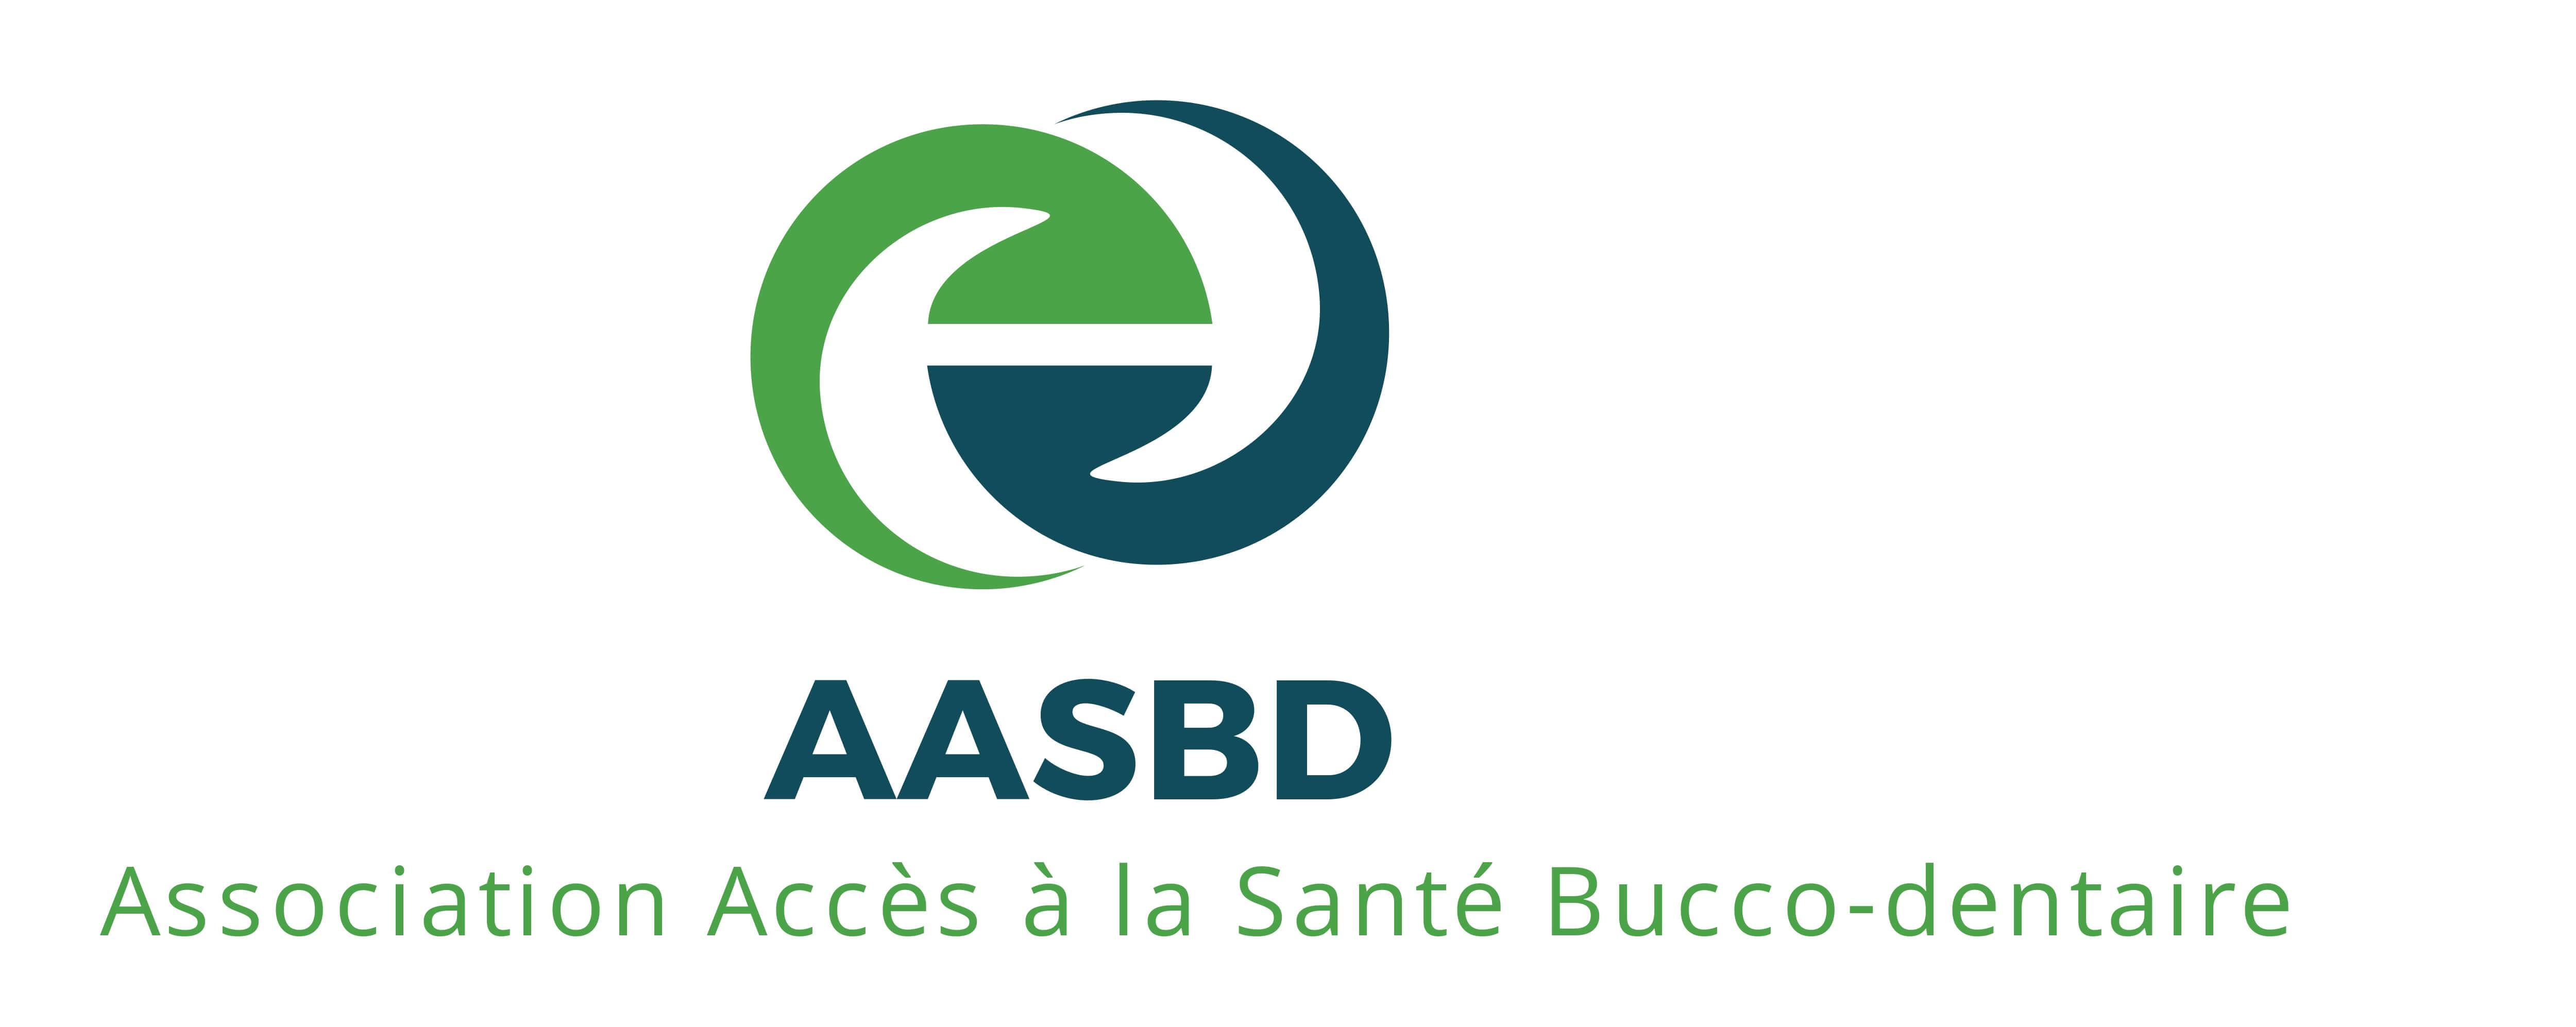 Logo de l'association AASBD